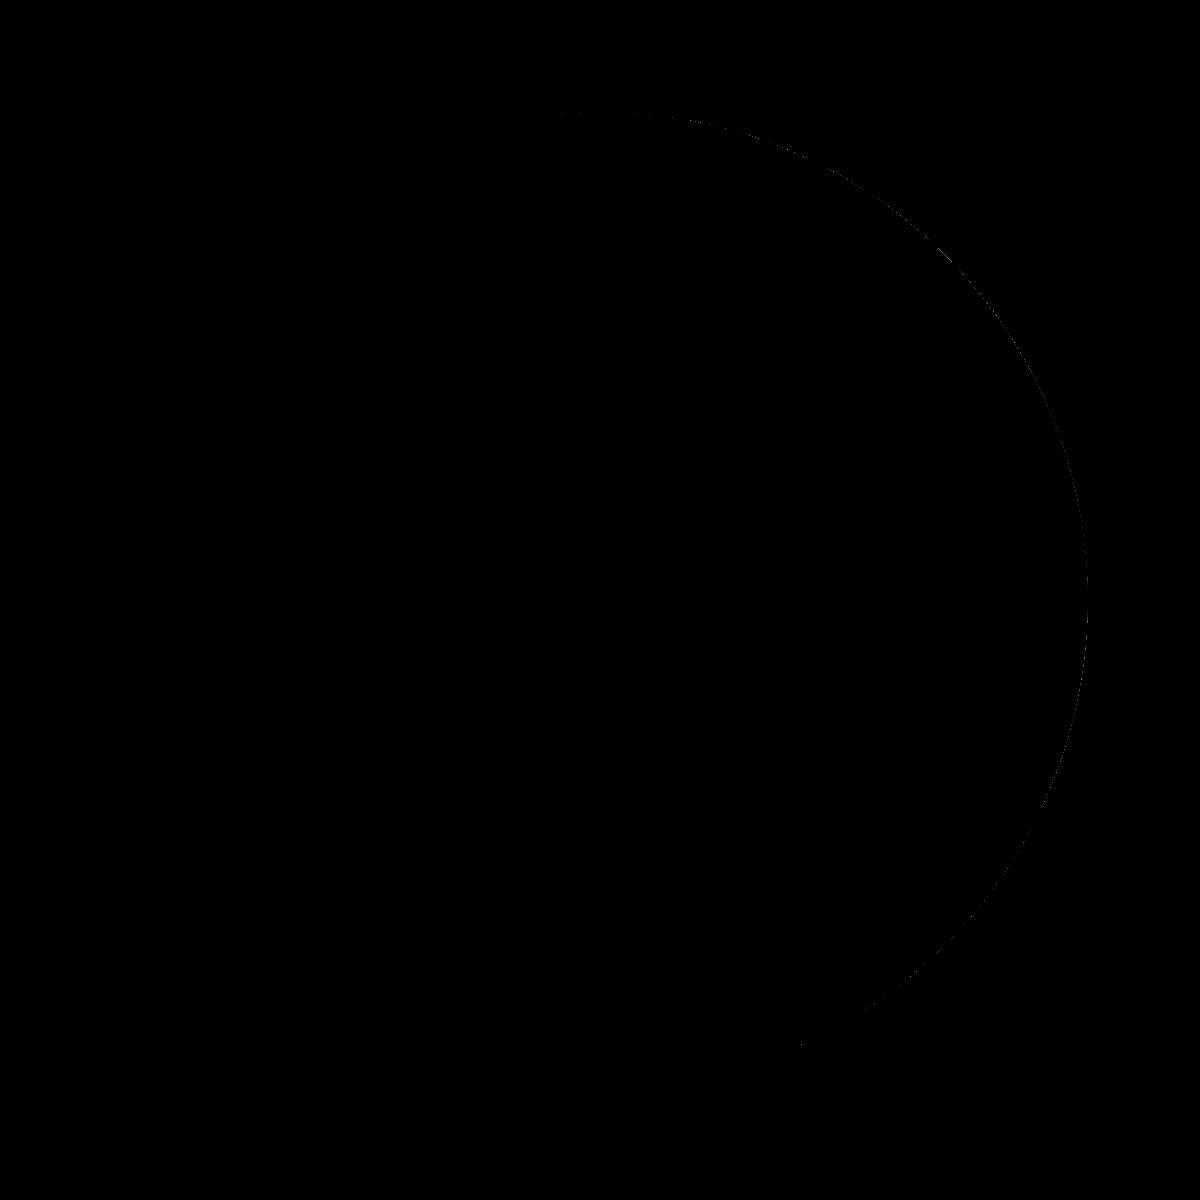 Lune du 3 juillet 2019